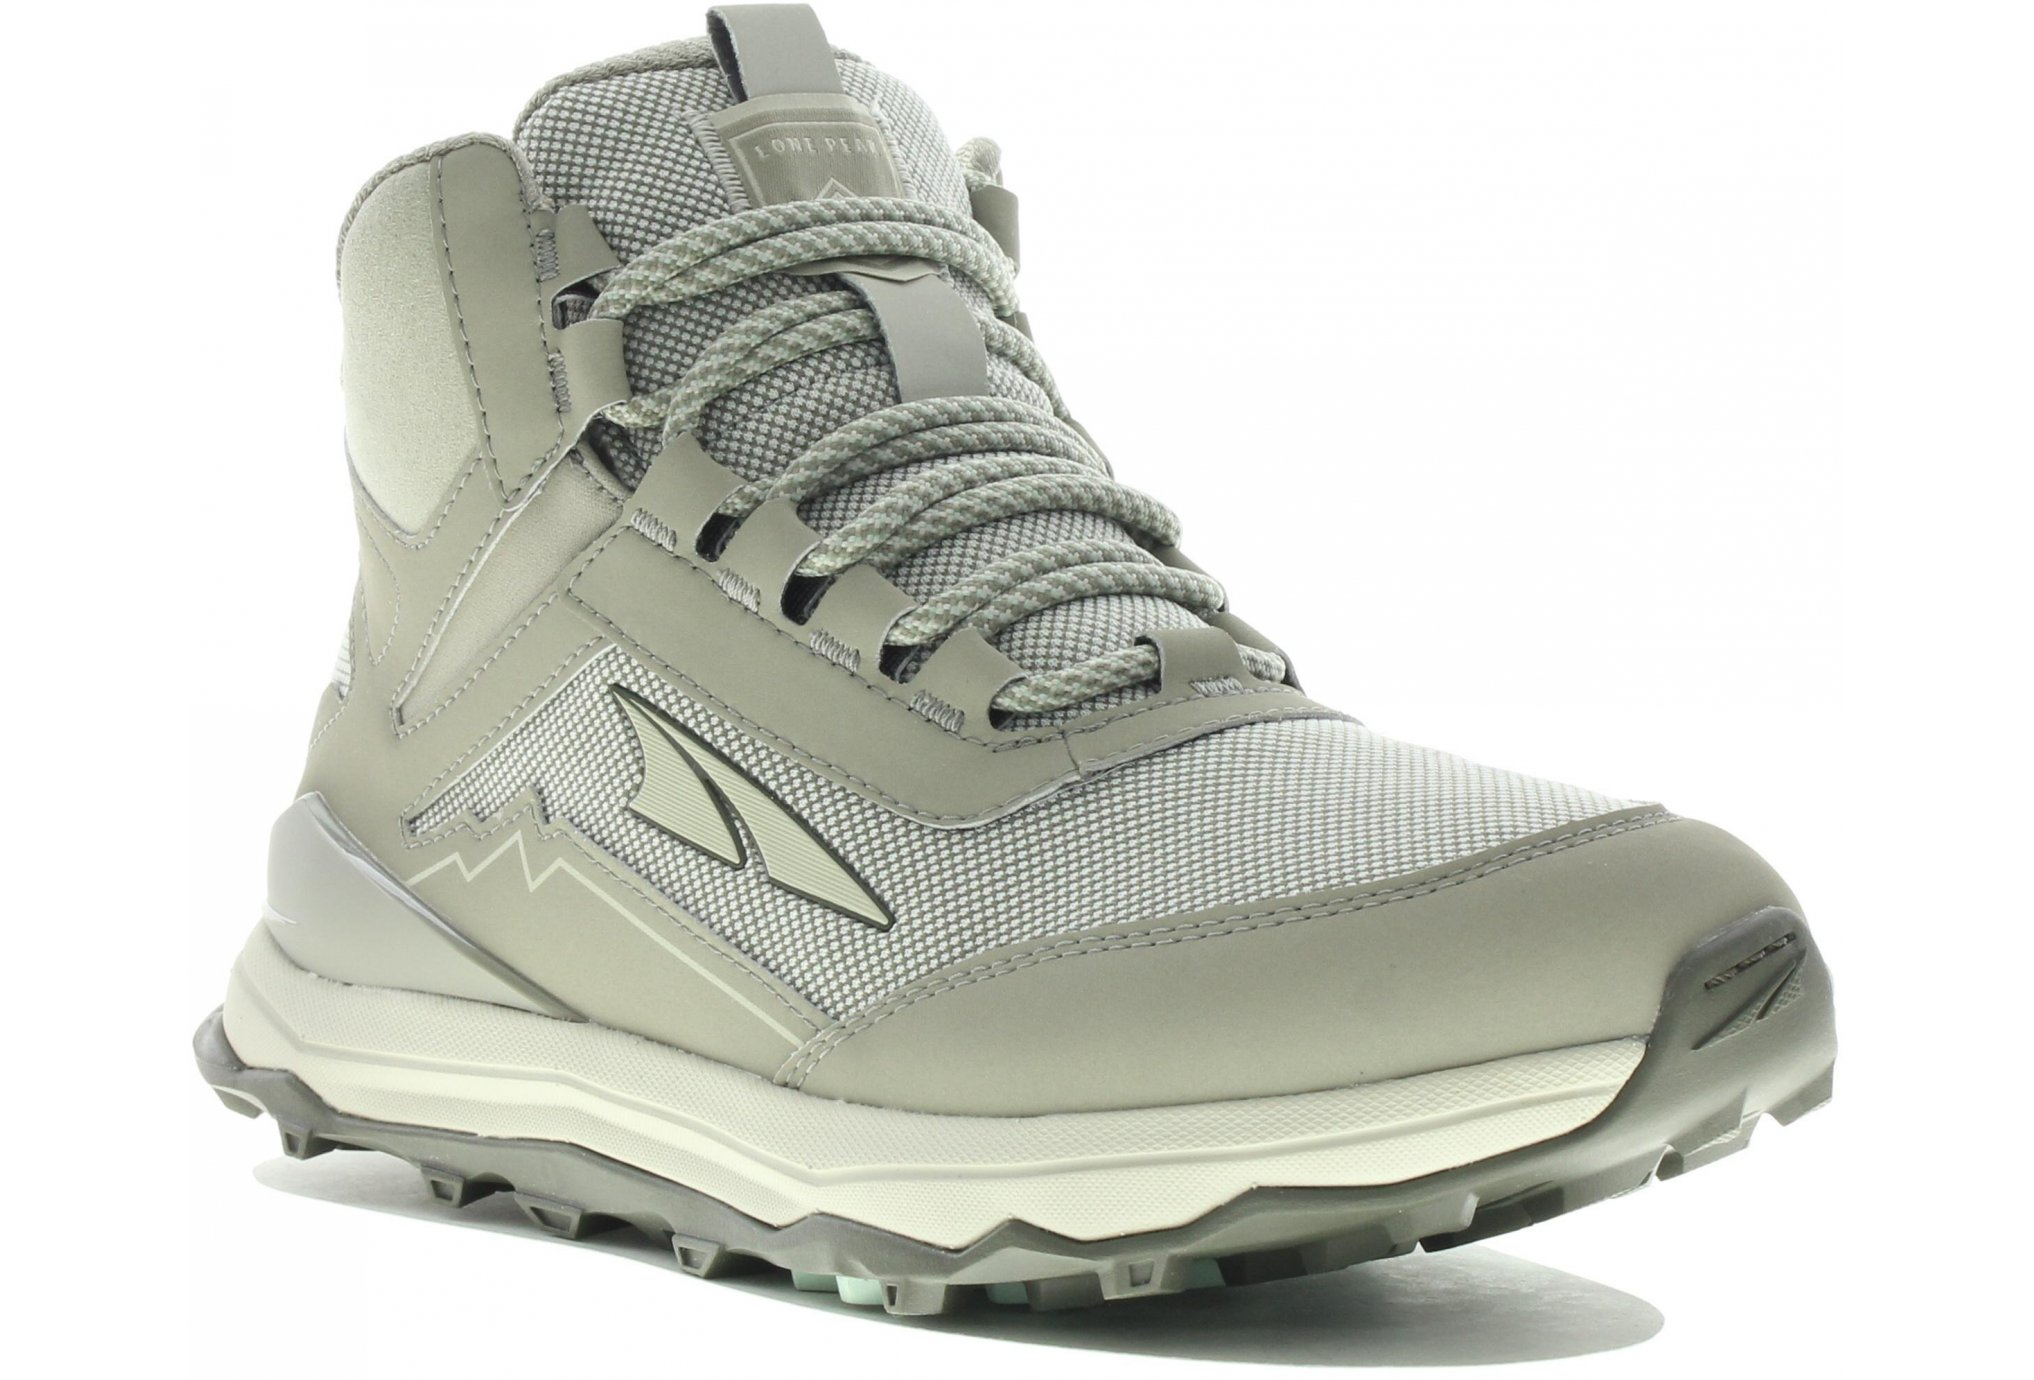 Altra Lone Peak Hiker W Chaussures running femme